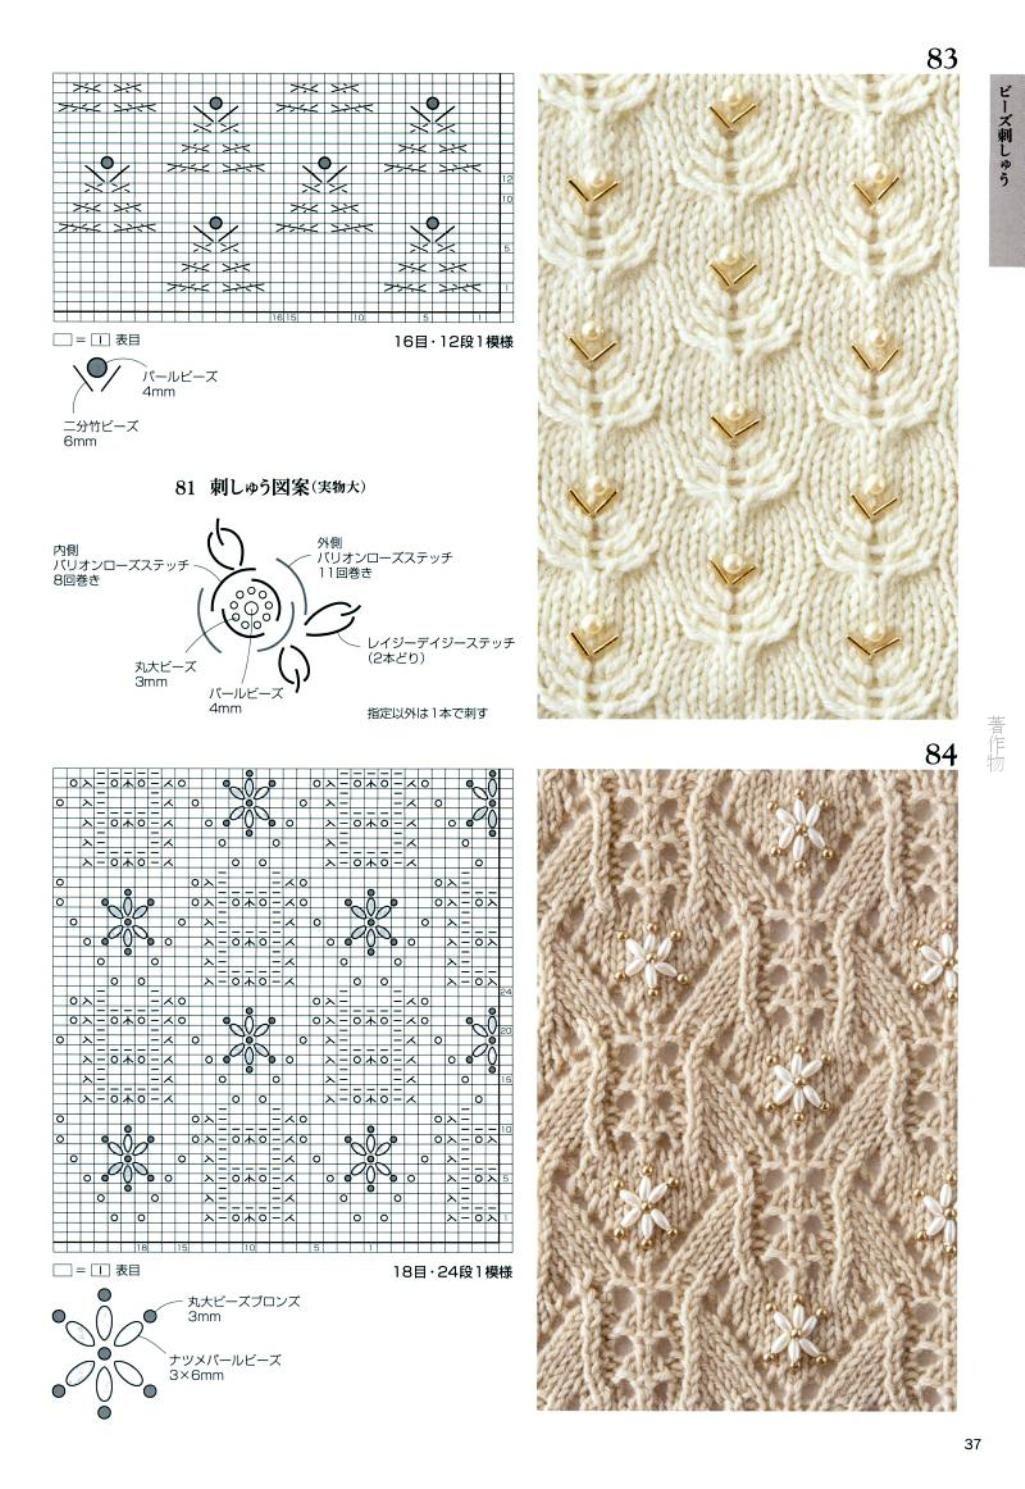 1279 mejores imágenes de Patrones en 2019 | Knits, Knitting needles ...